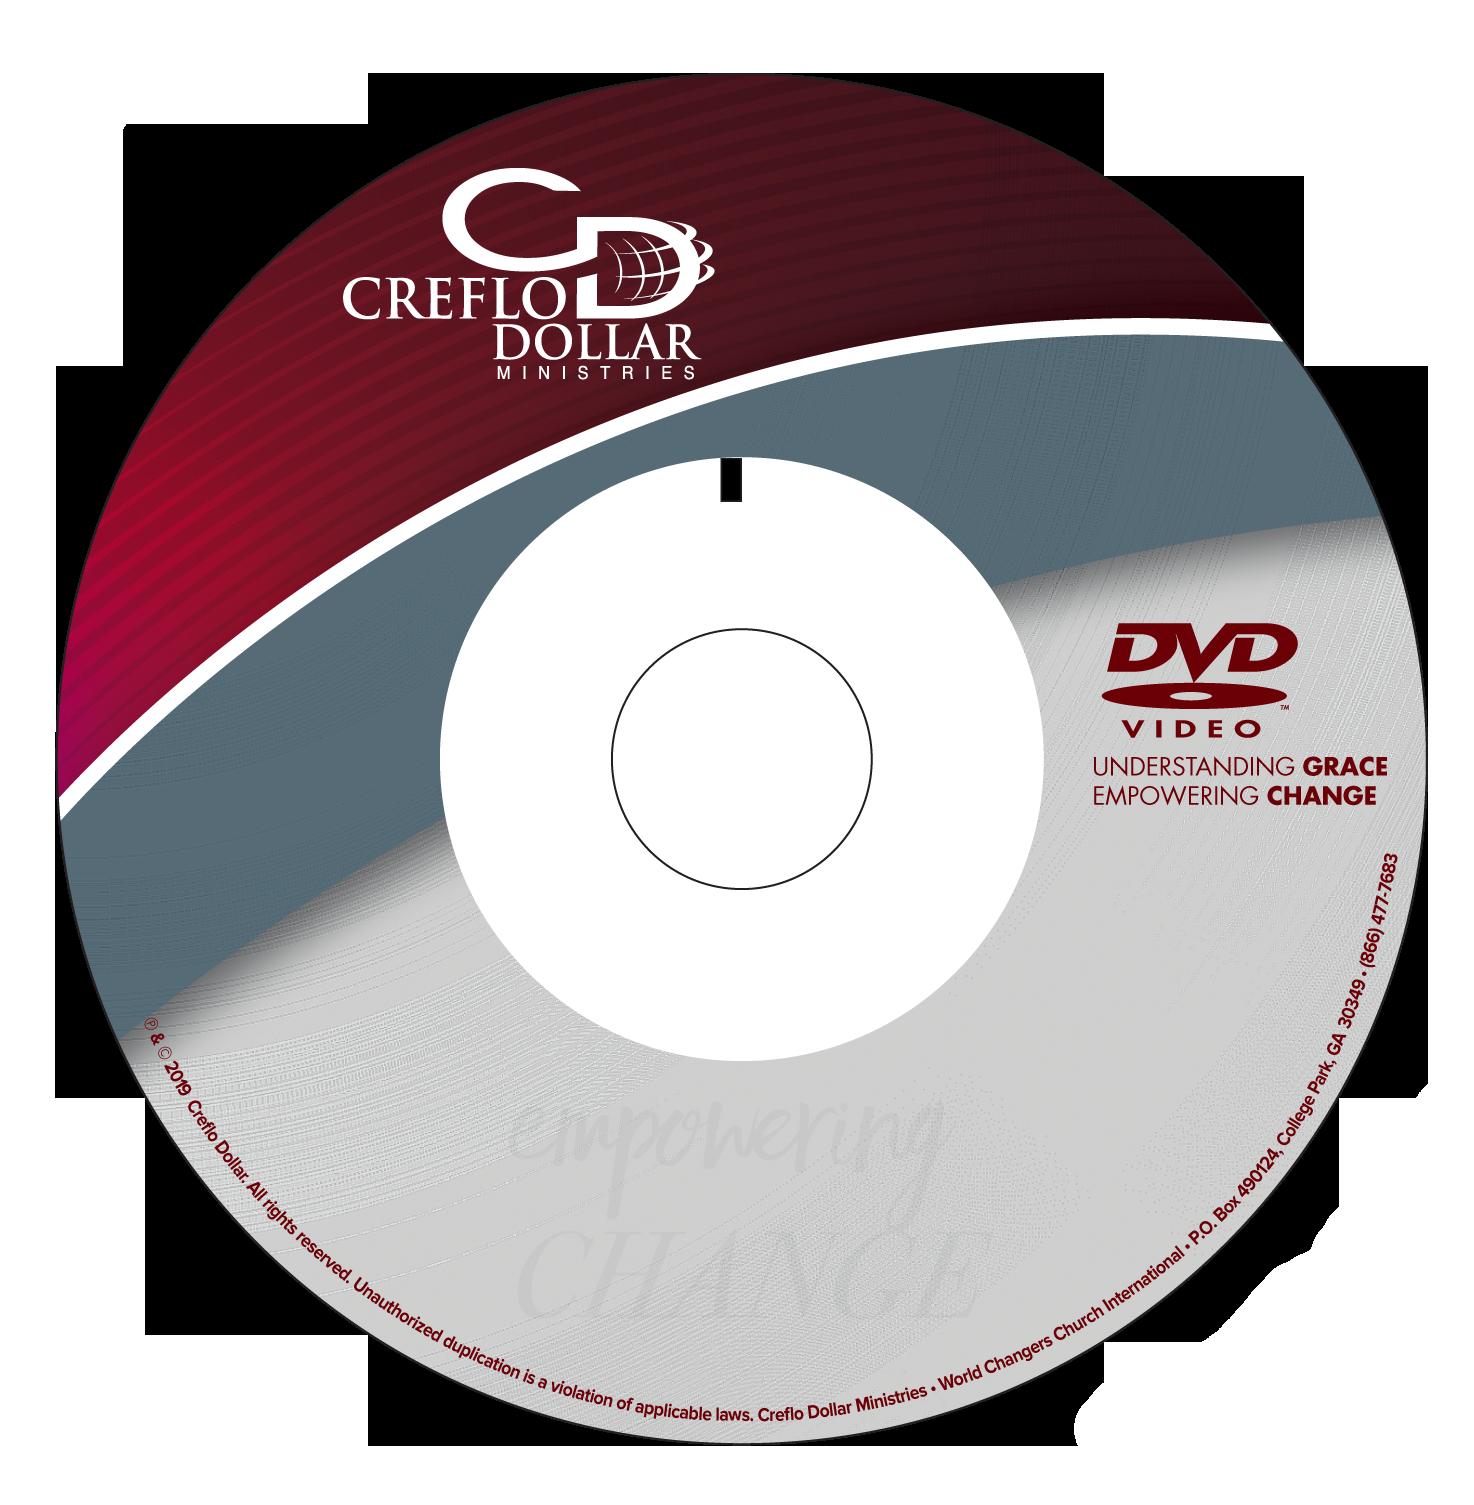 051219 Sunday Service DVD 10am